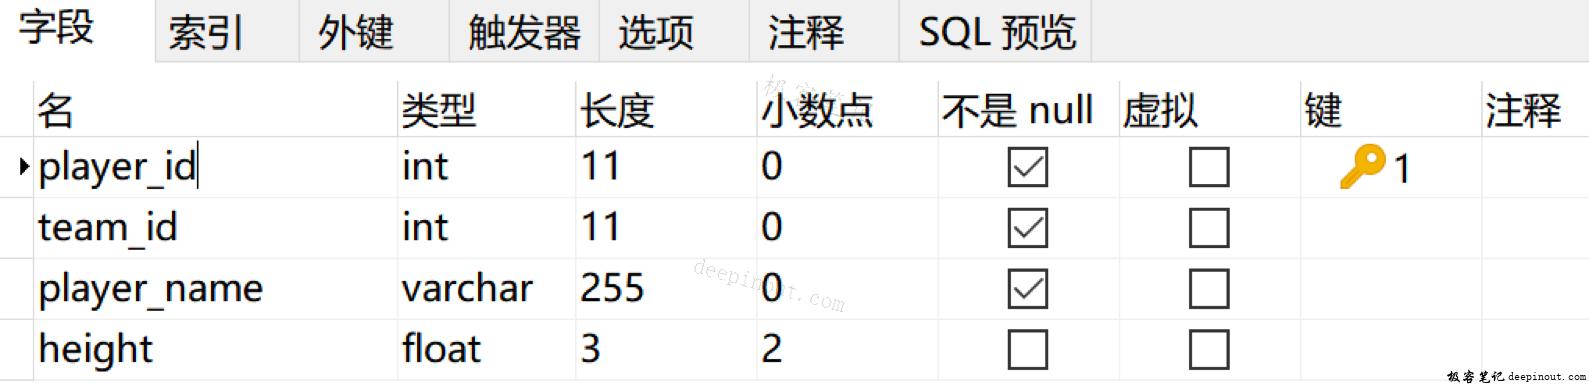 SQL DDL介绍